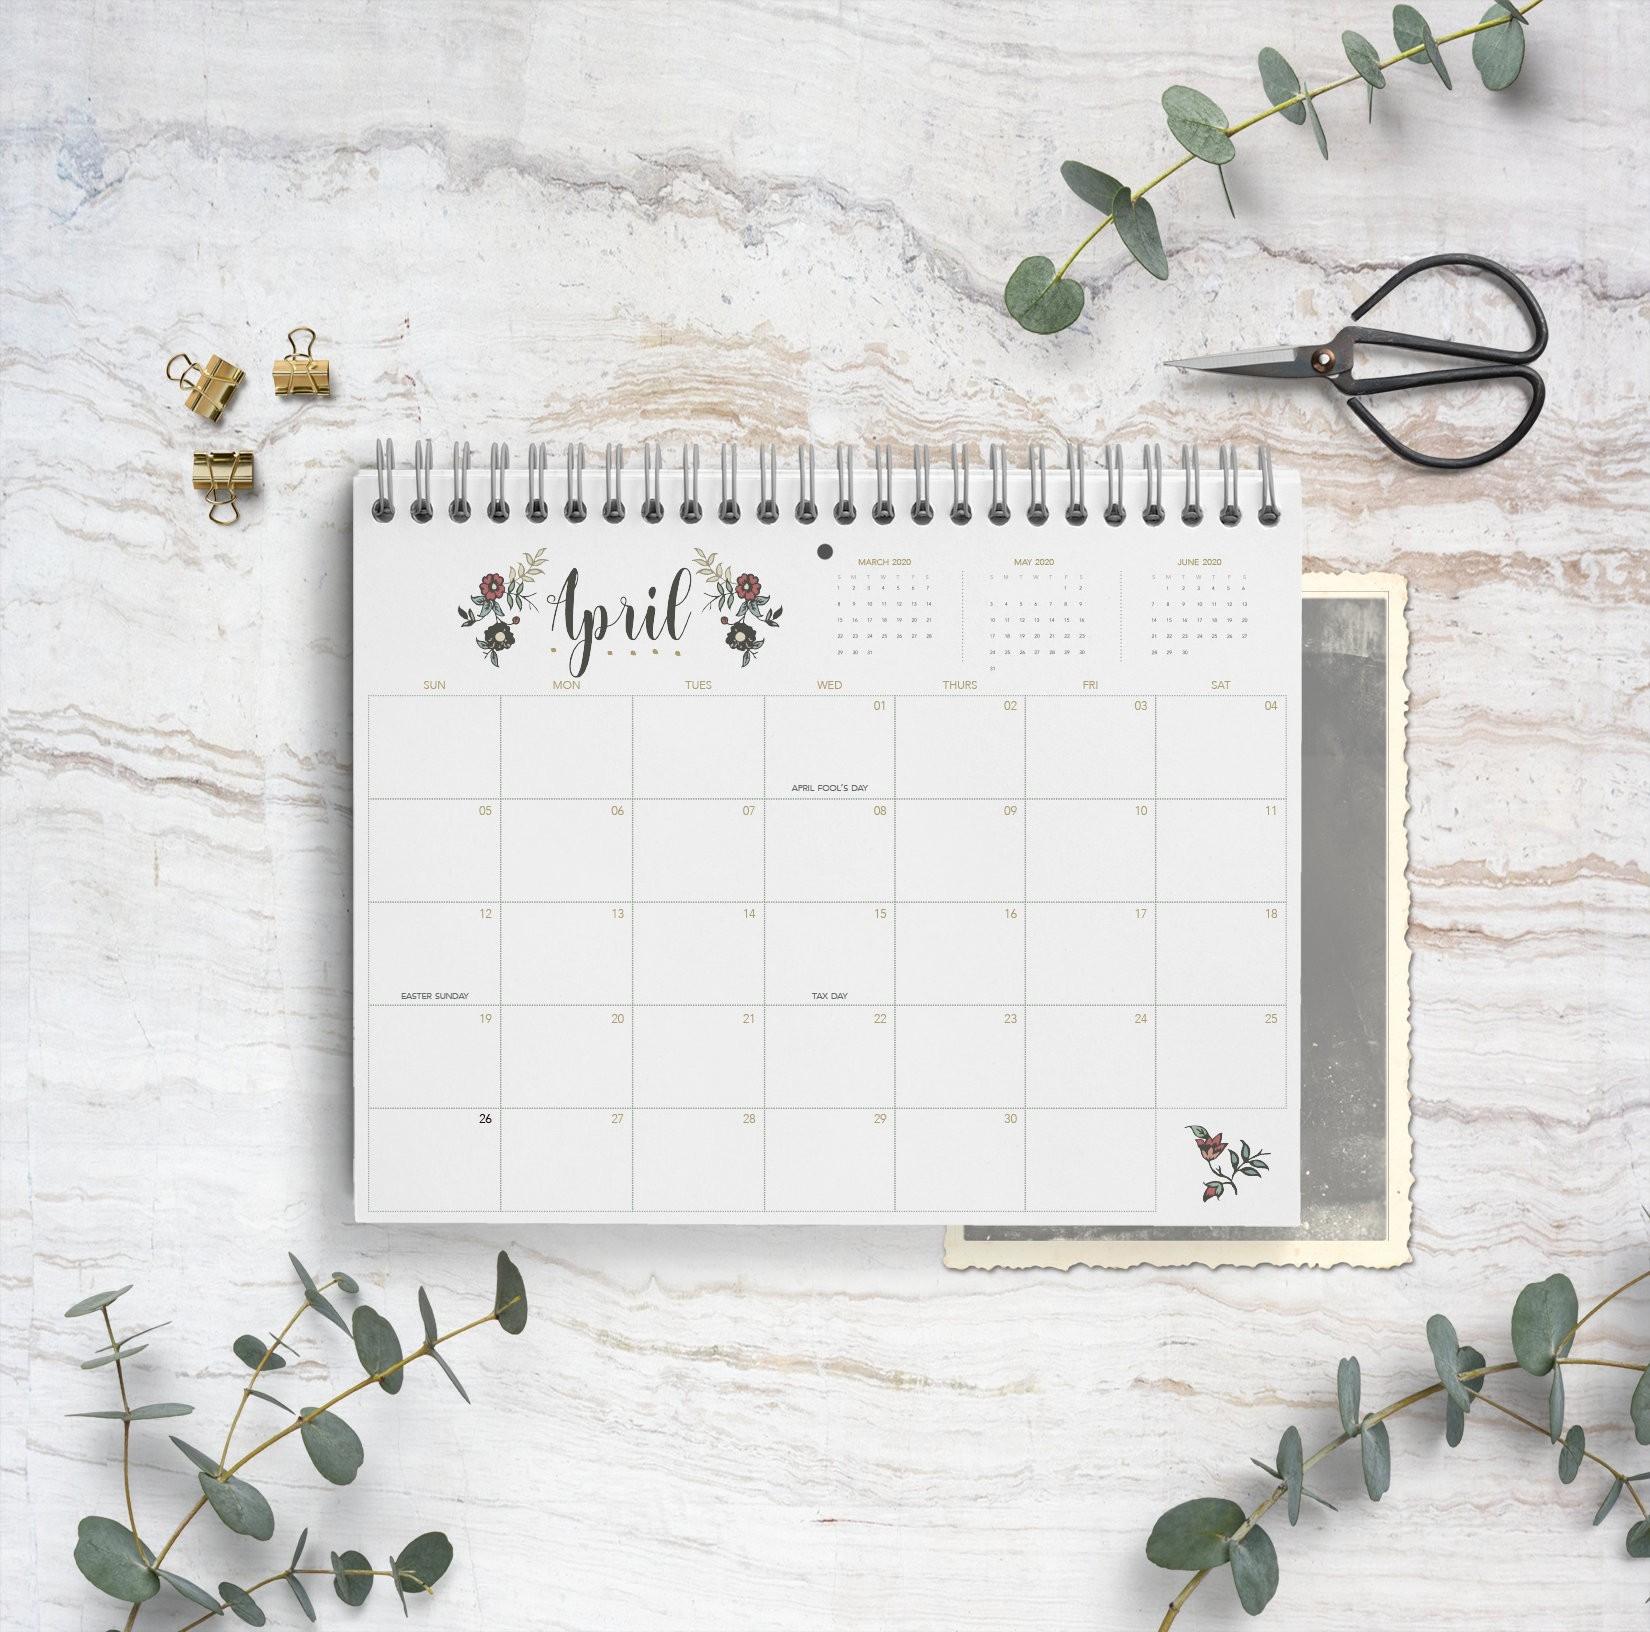 2020 Calendar Jane / Spiral Bound Calendar / Monthly Calendar / Floral  Calendar / Wall Calendar / Organize / Planner / Gift / Month-Spiral Bound Monthly Calendar